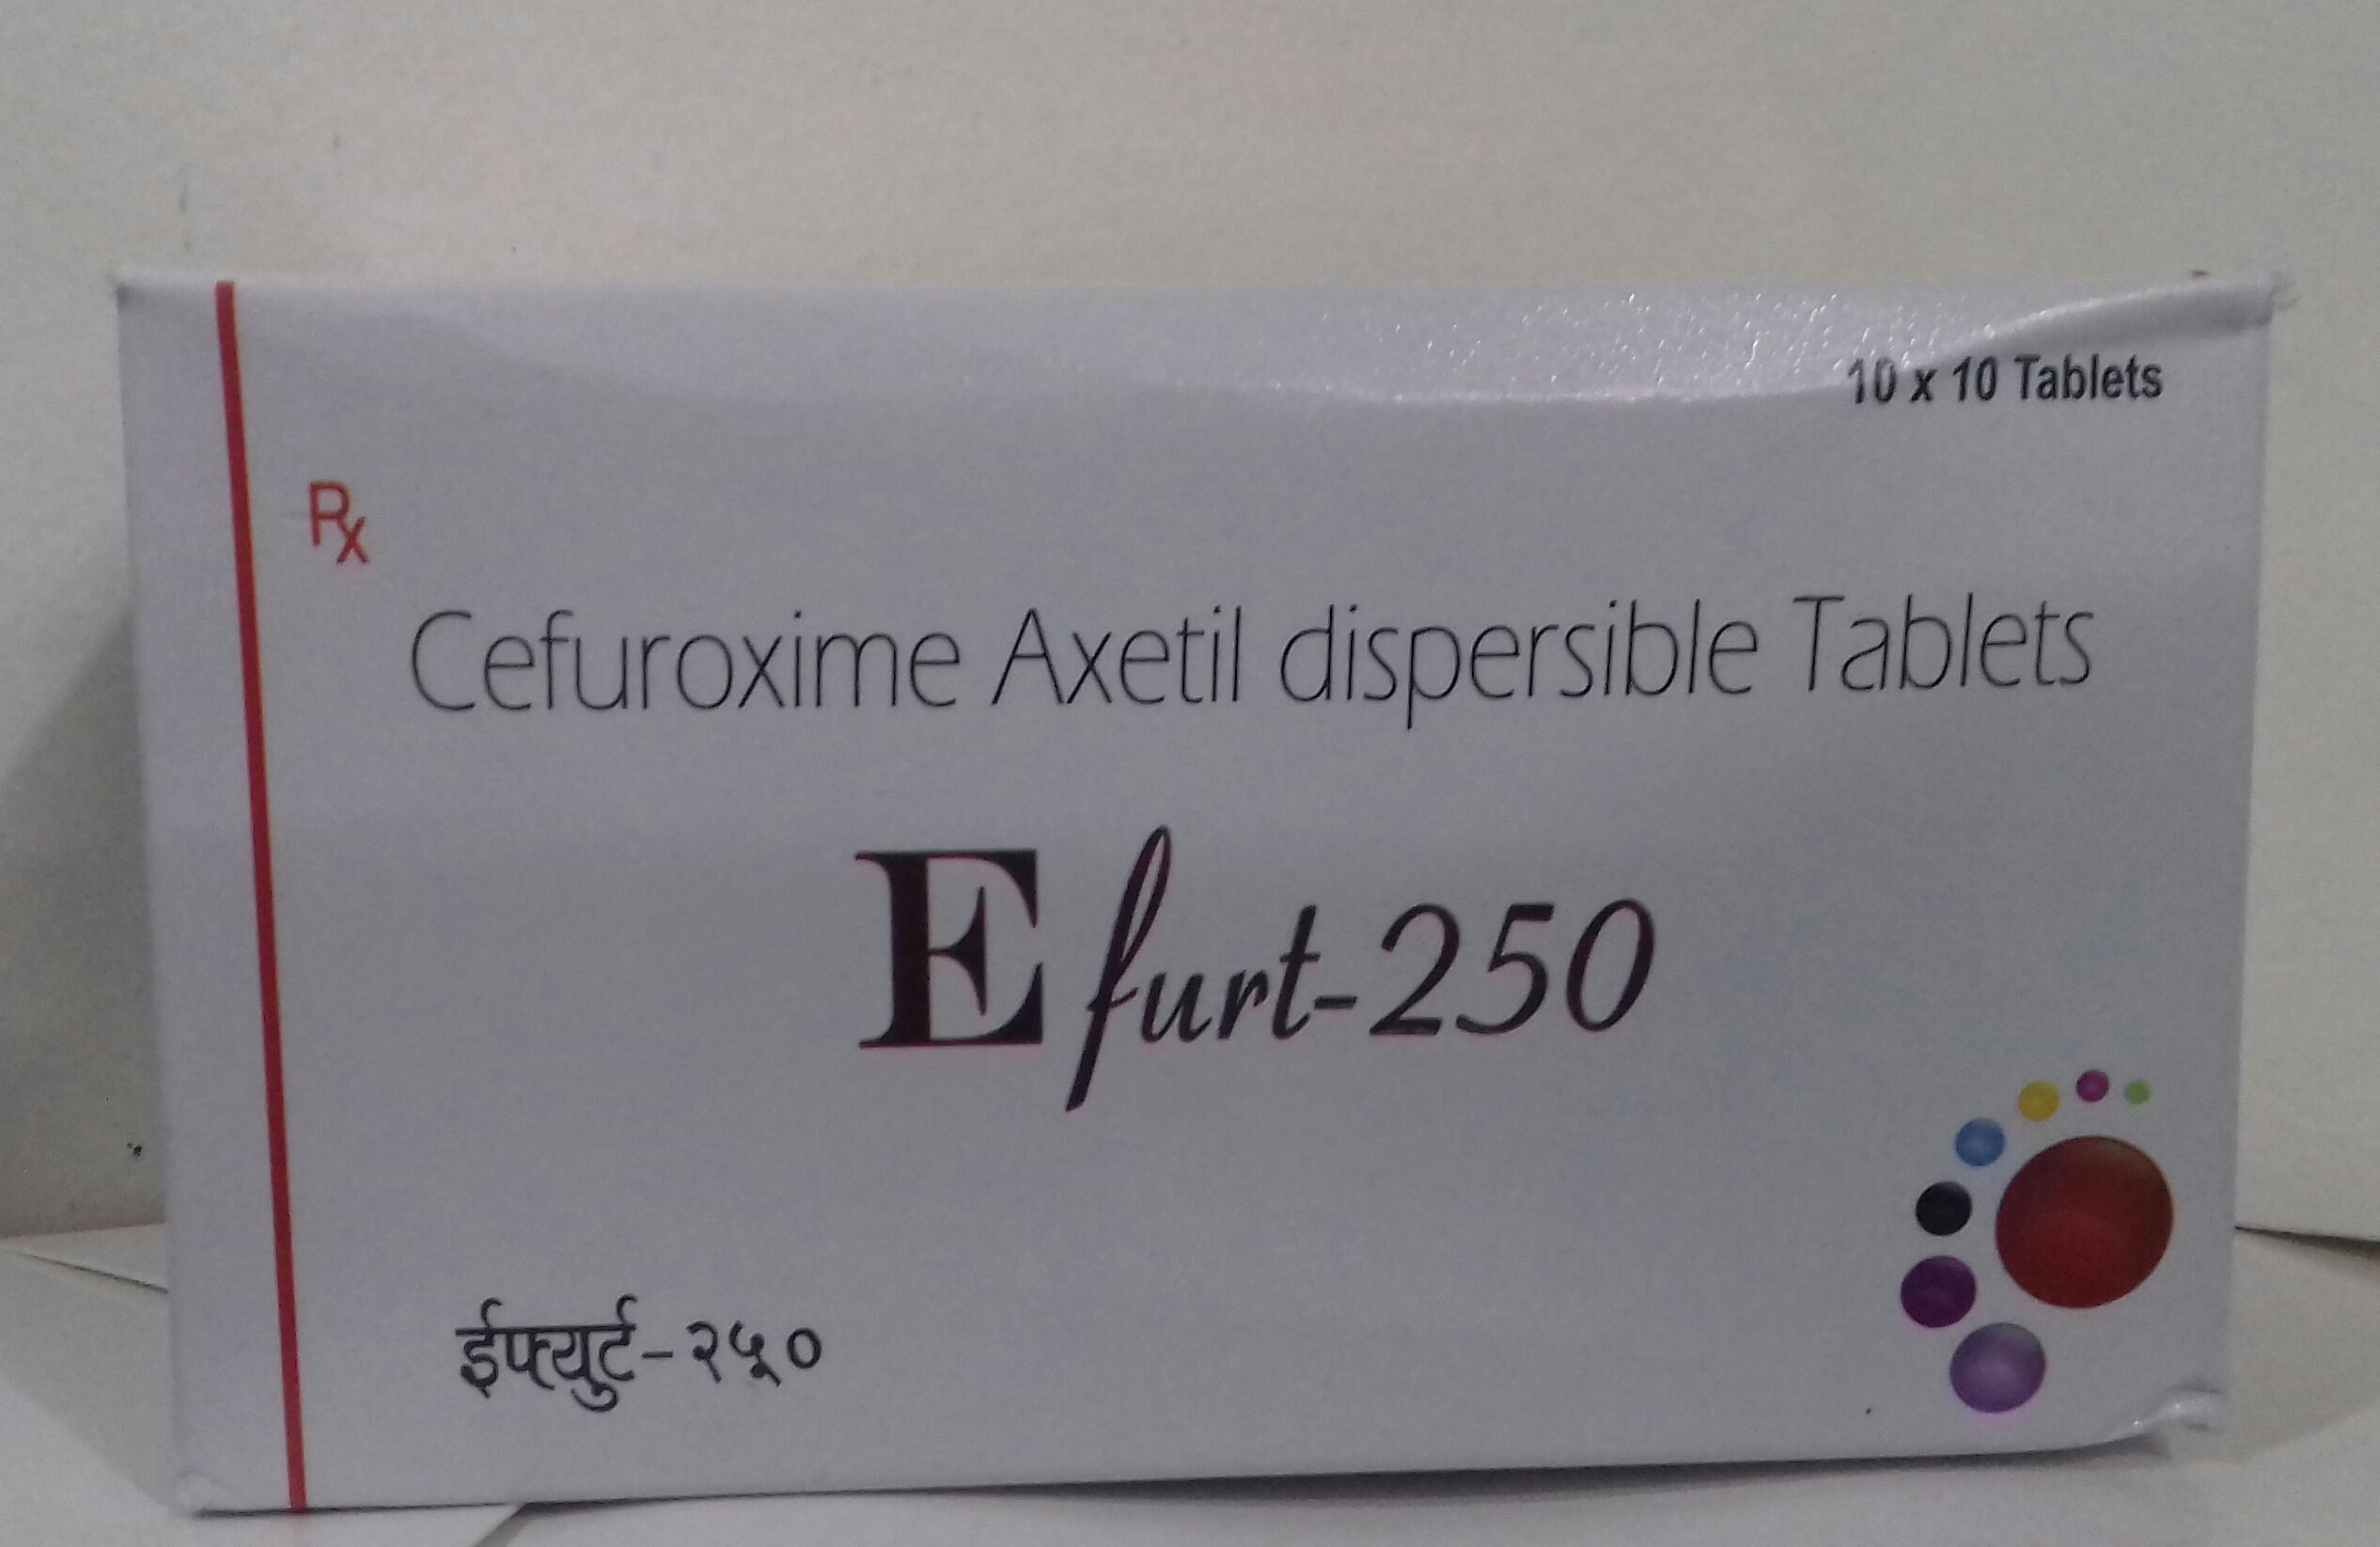 Cefuroxime Tablet